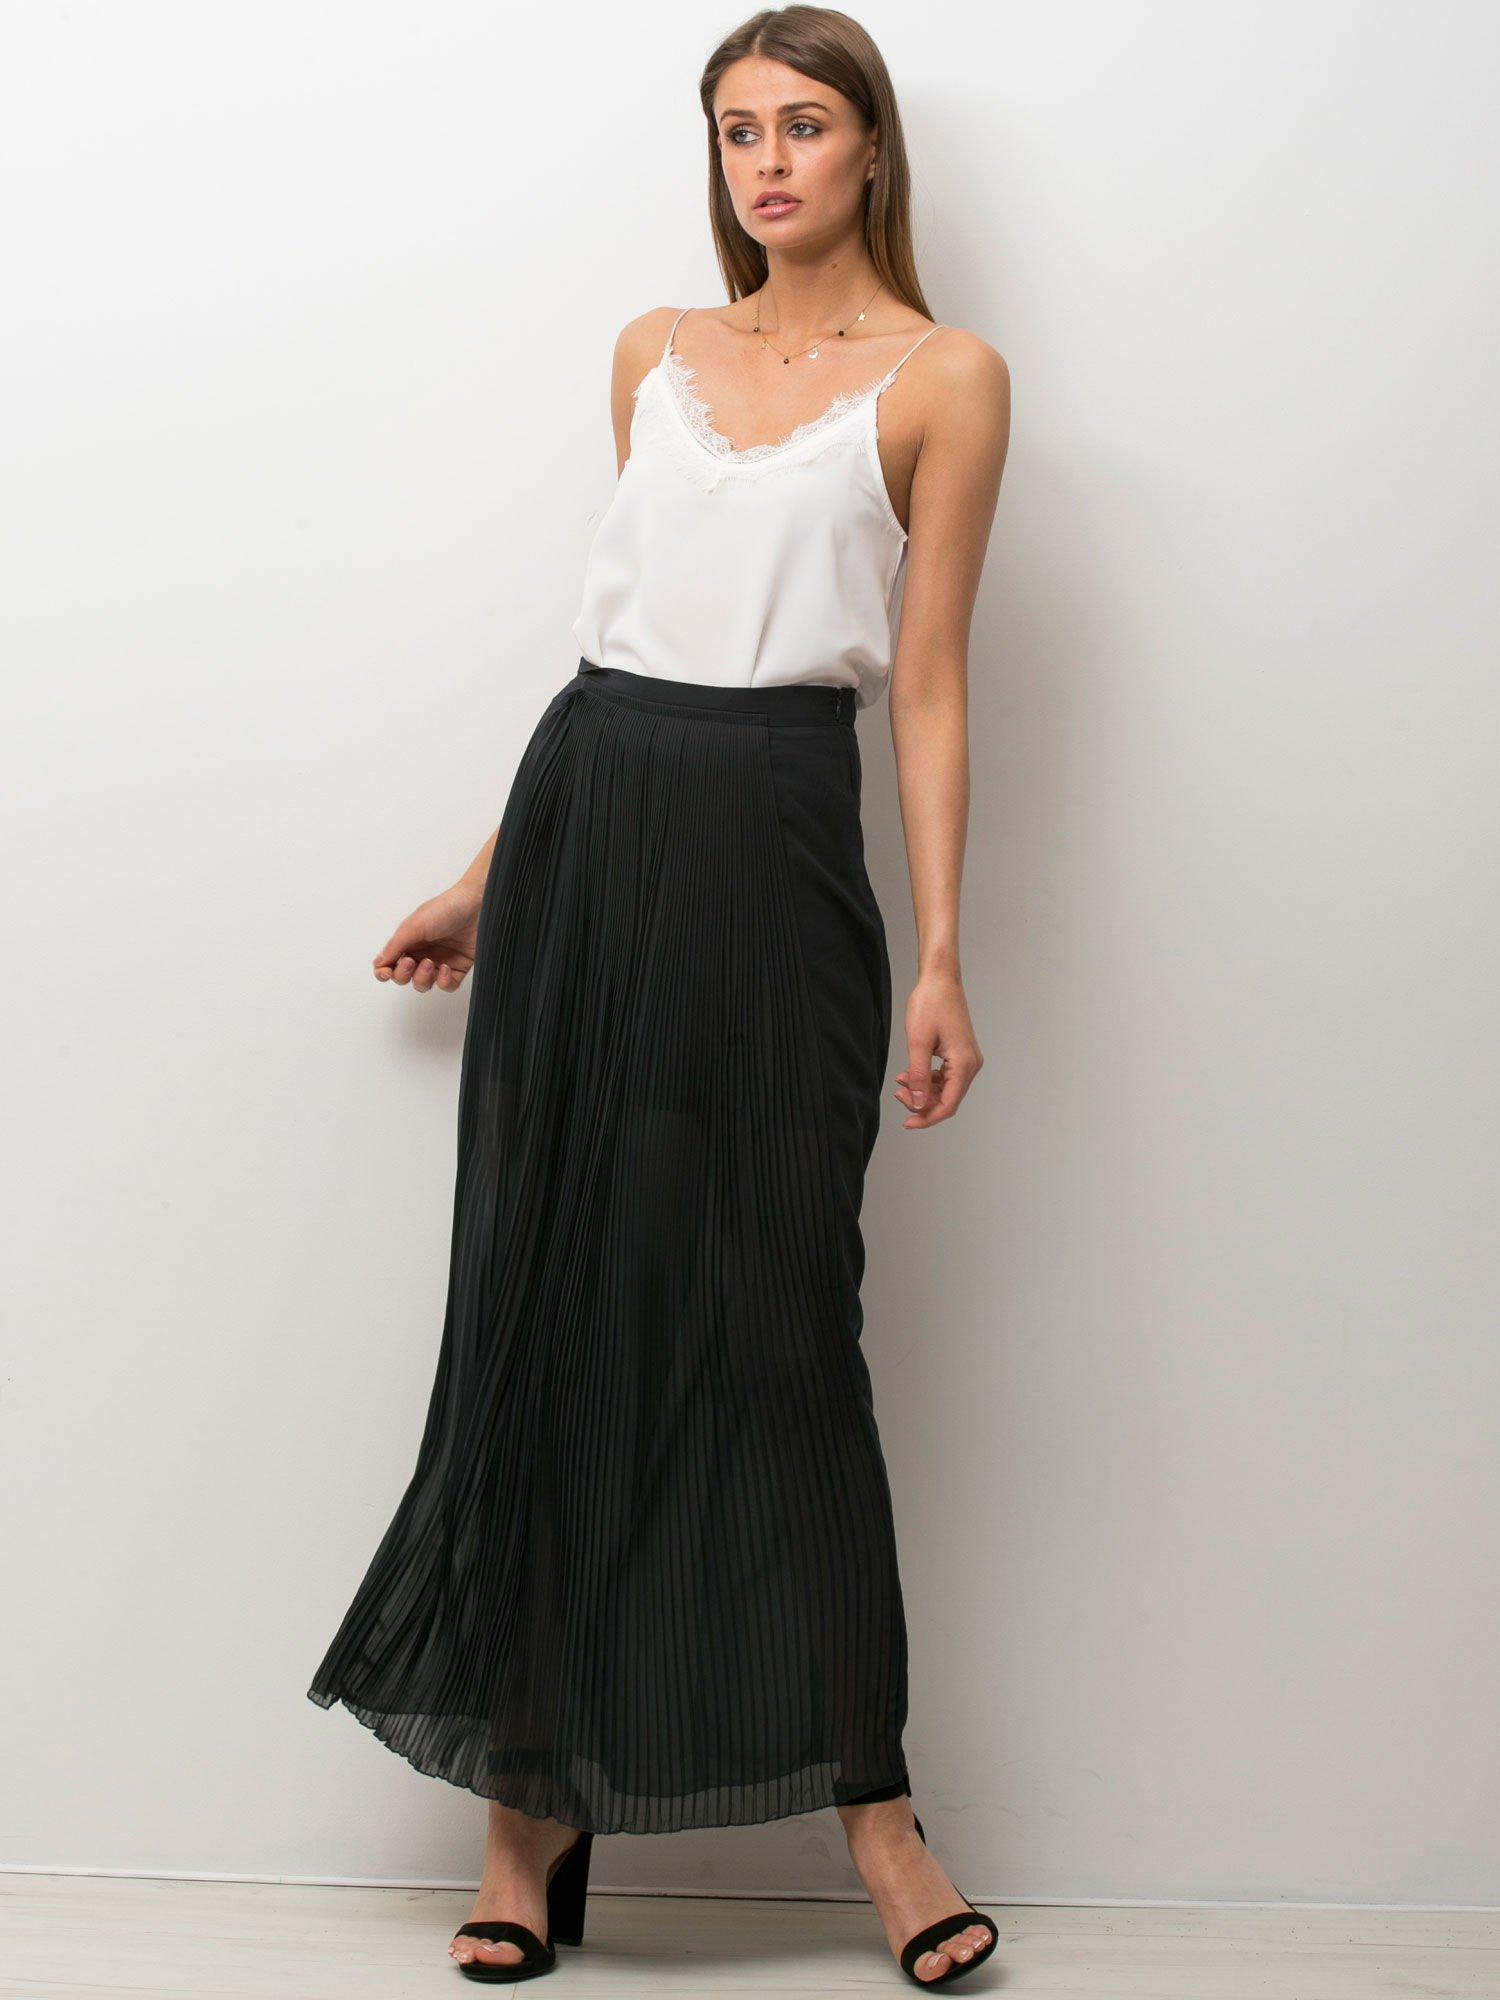 Czarna półtransparentna spódnica maxi plisowana                                  zdj.                                  1